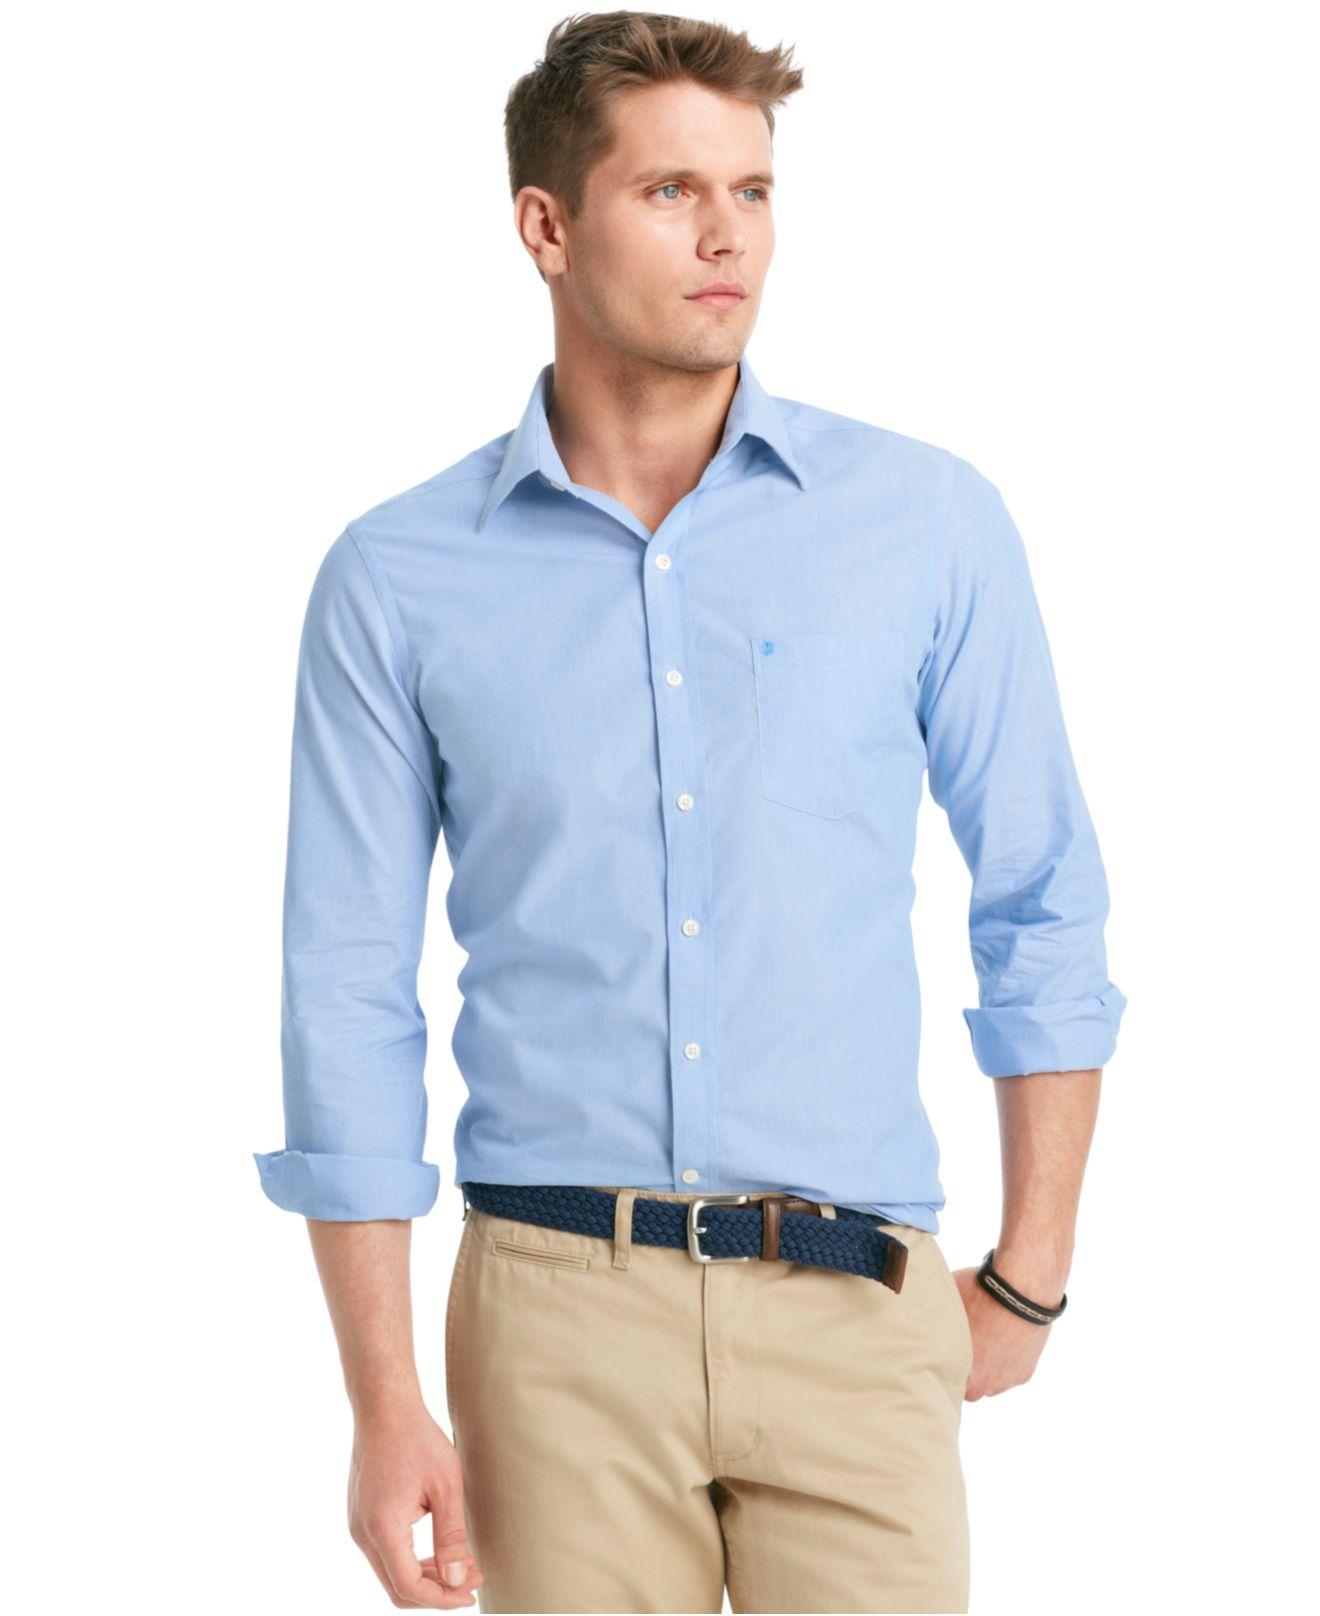 Lyst Izod Shirt Slim Fit Essential Striped Shirt In Blue For Men